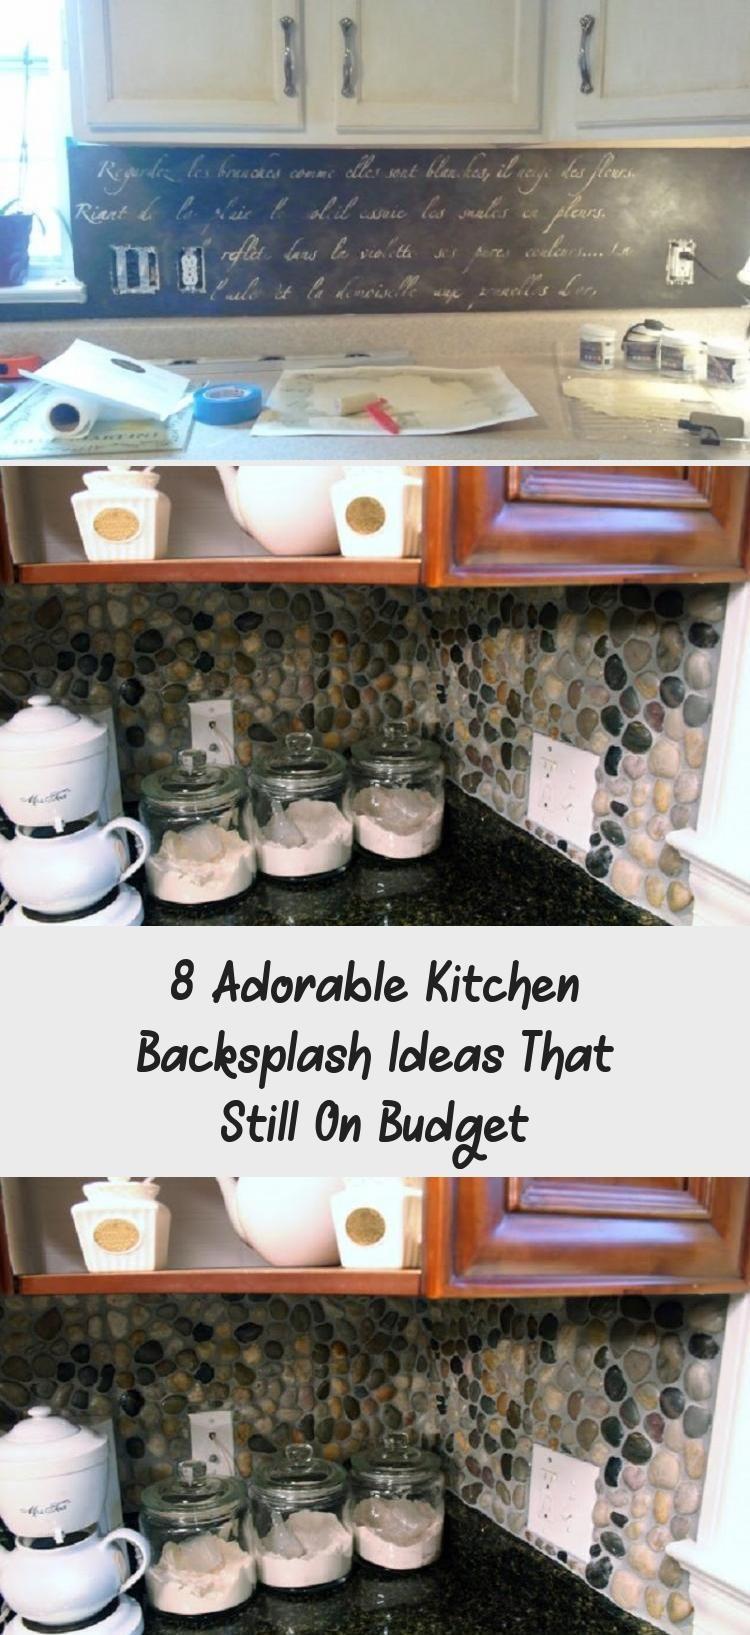 8 Adorable Kitchen Backsplash Ideas That Still On Budget # #backsplah #budget #c… Kitchen